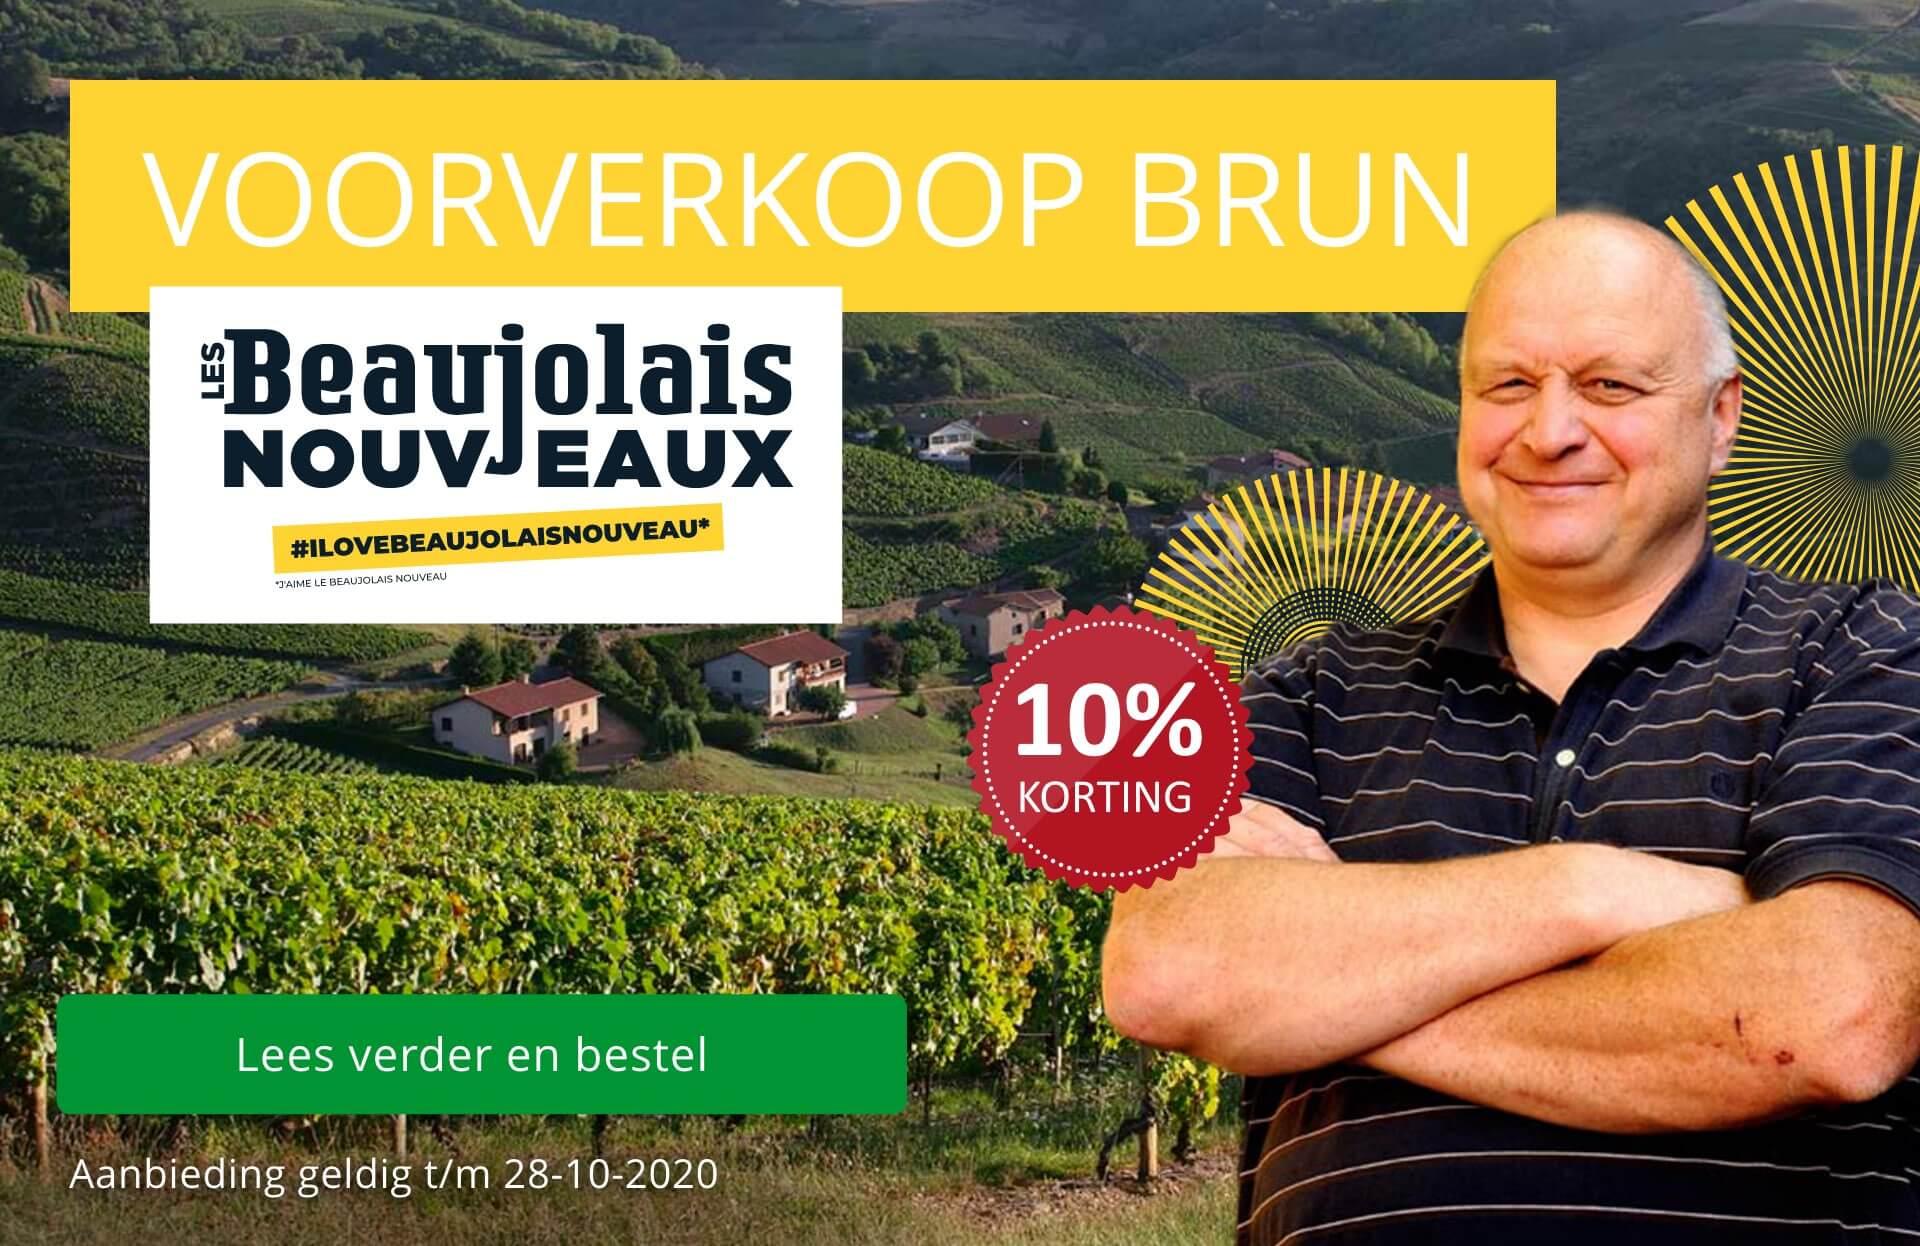 Voorverkoop Beaujolais Nouveau 2020 van Jean-Paul Brun